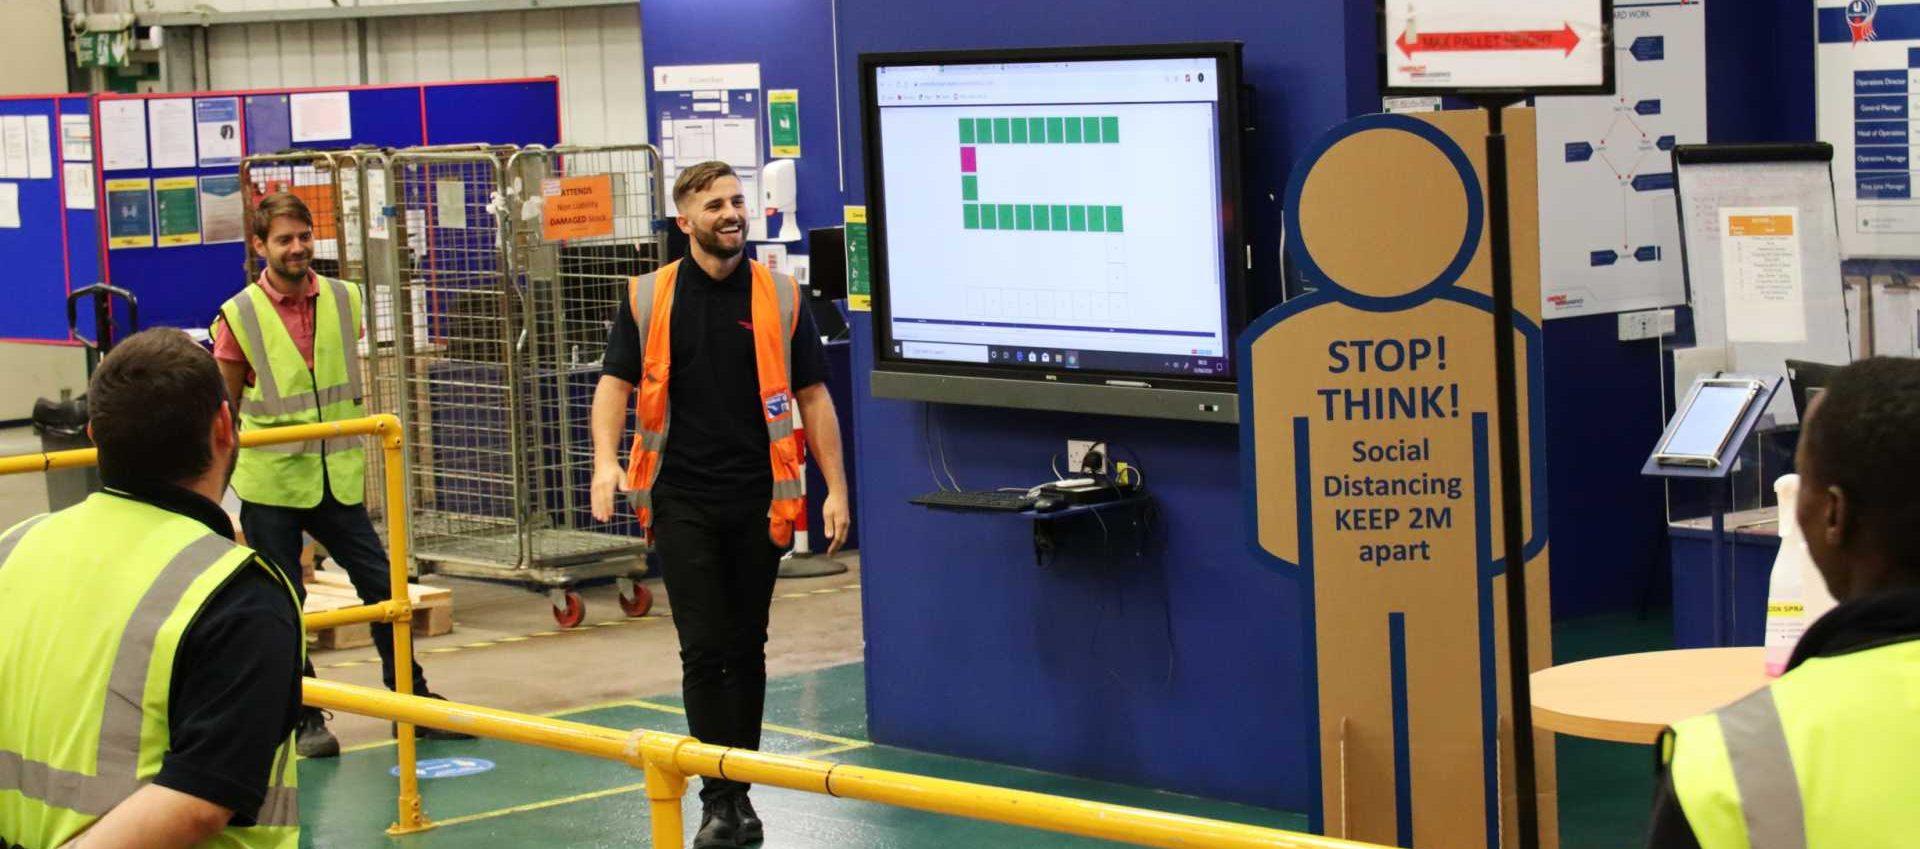 A COVID-19 Secure Unipart distribution centre